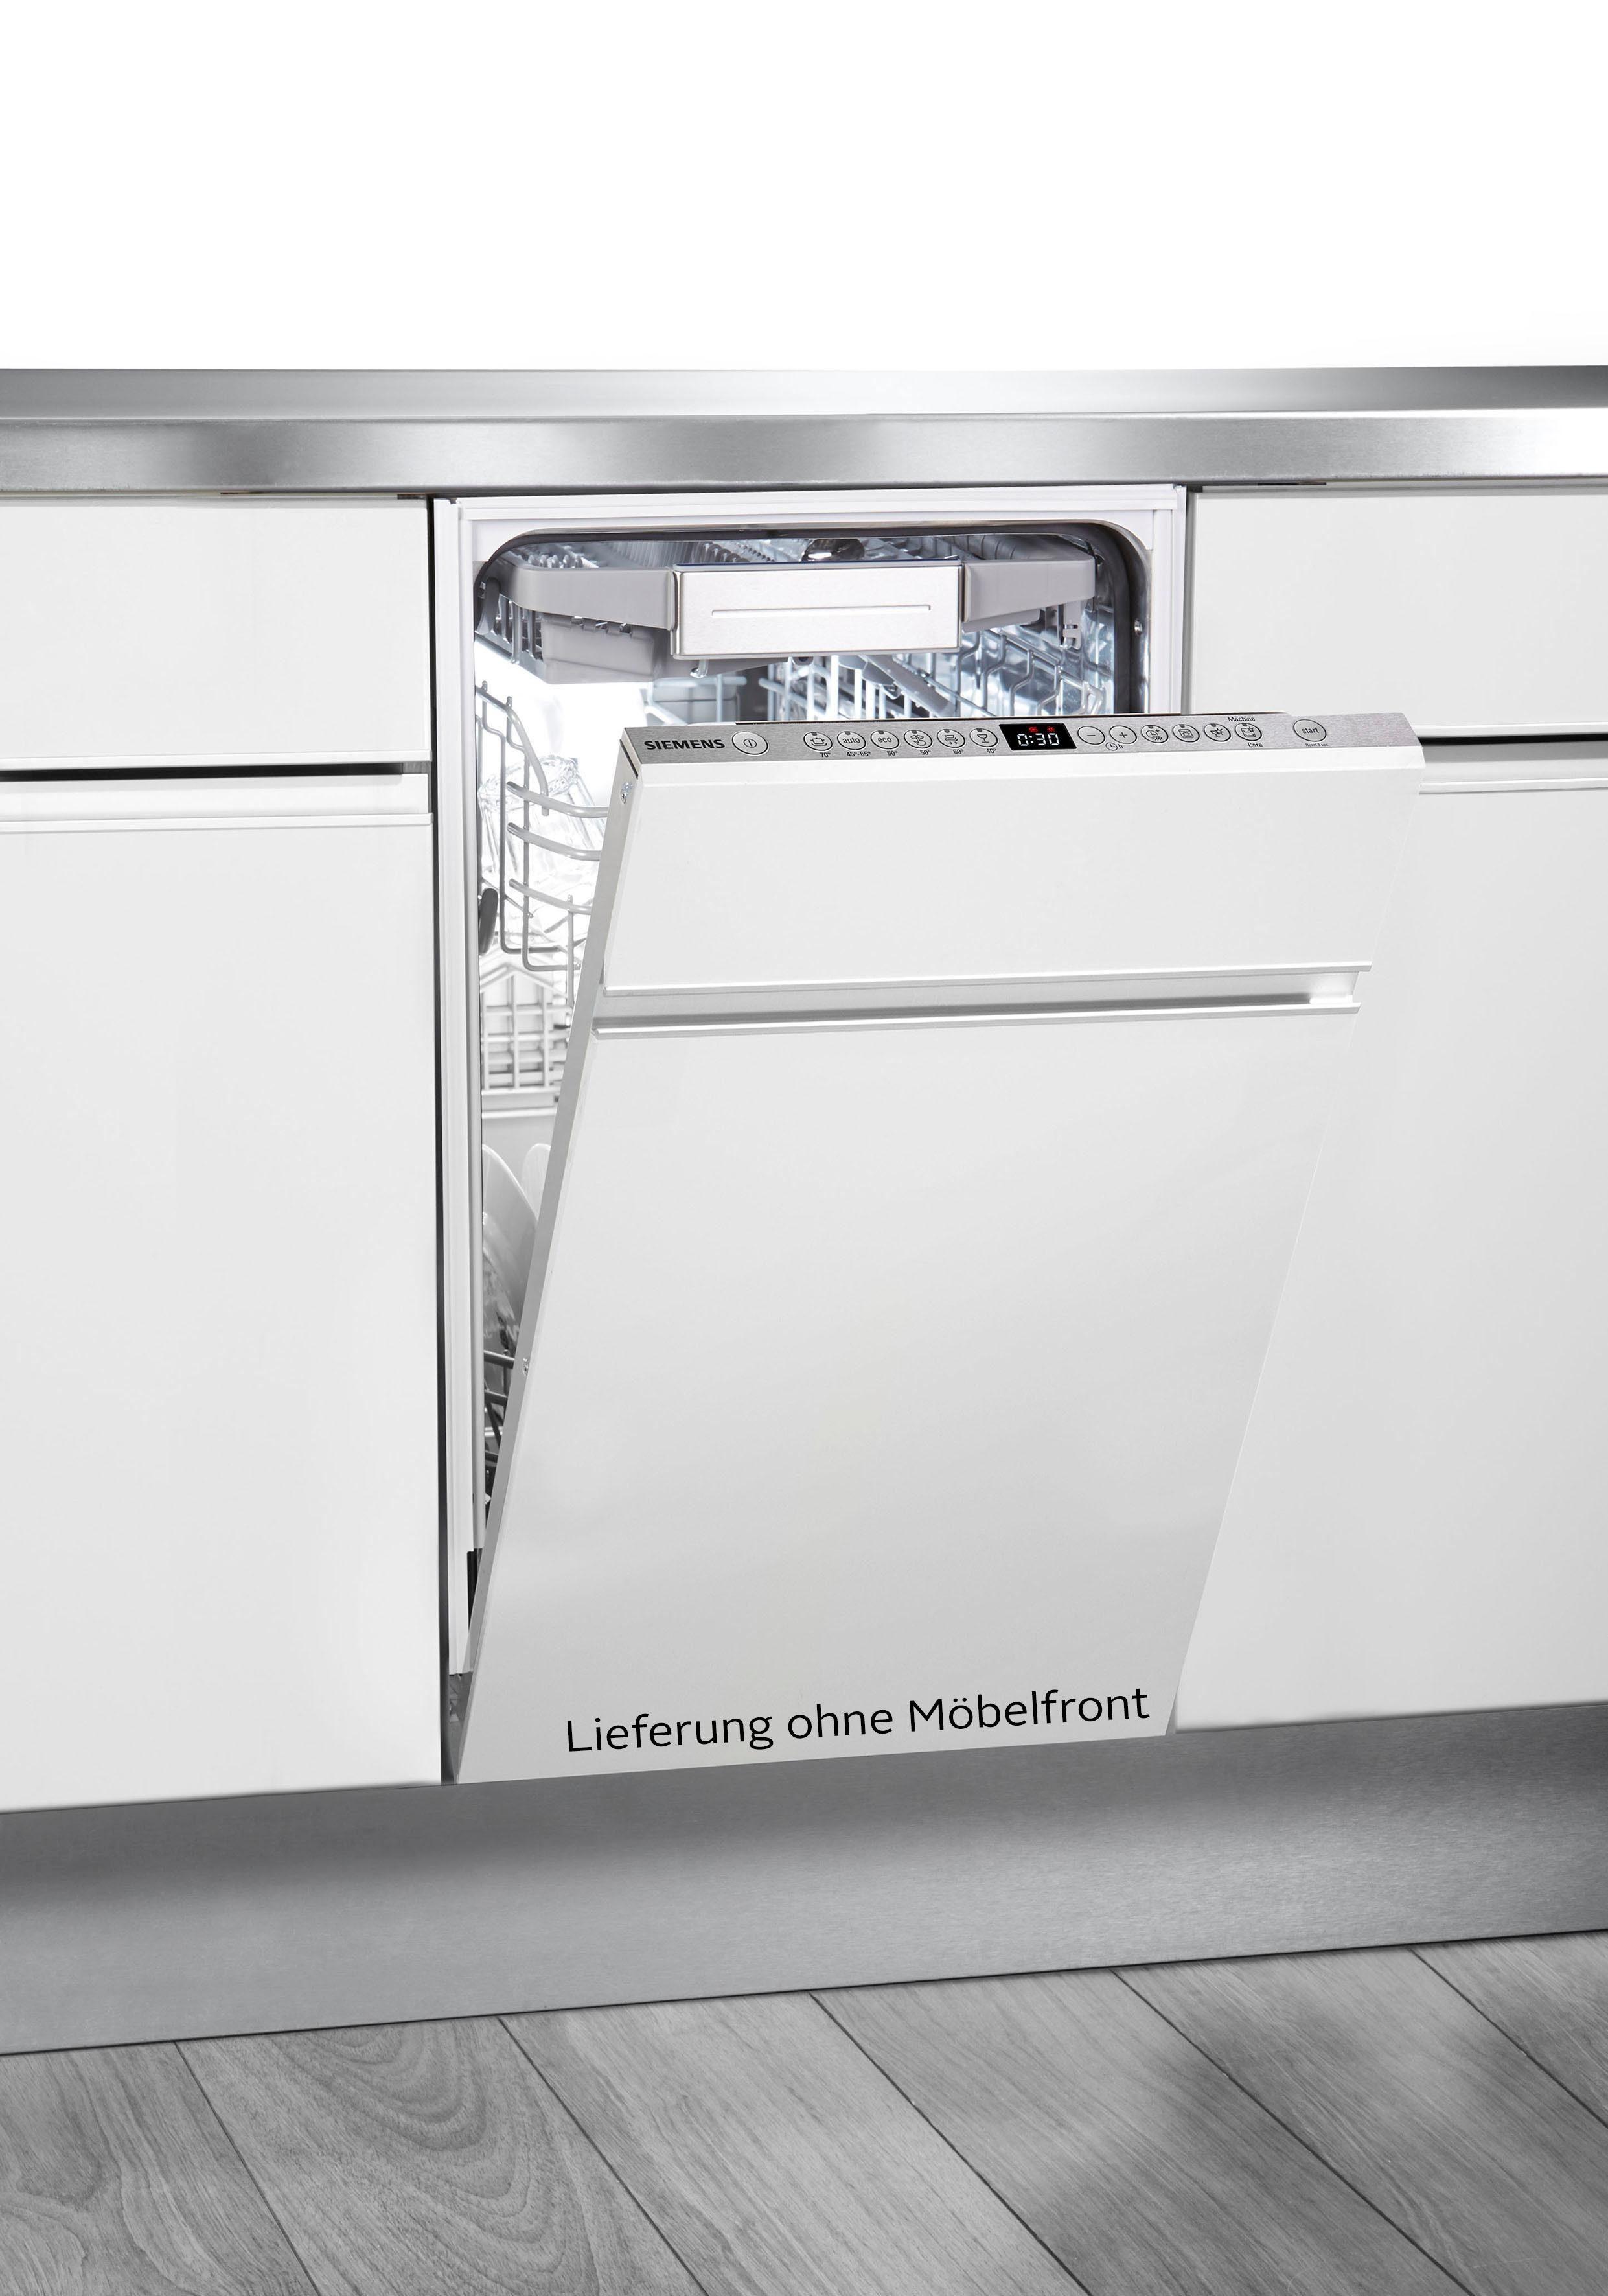 SIEMENS vollintegrierbarer Geschirrspüler iQ500, SR656X01TE, 9,5 l, 10 Maßgedecke